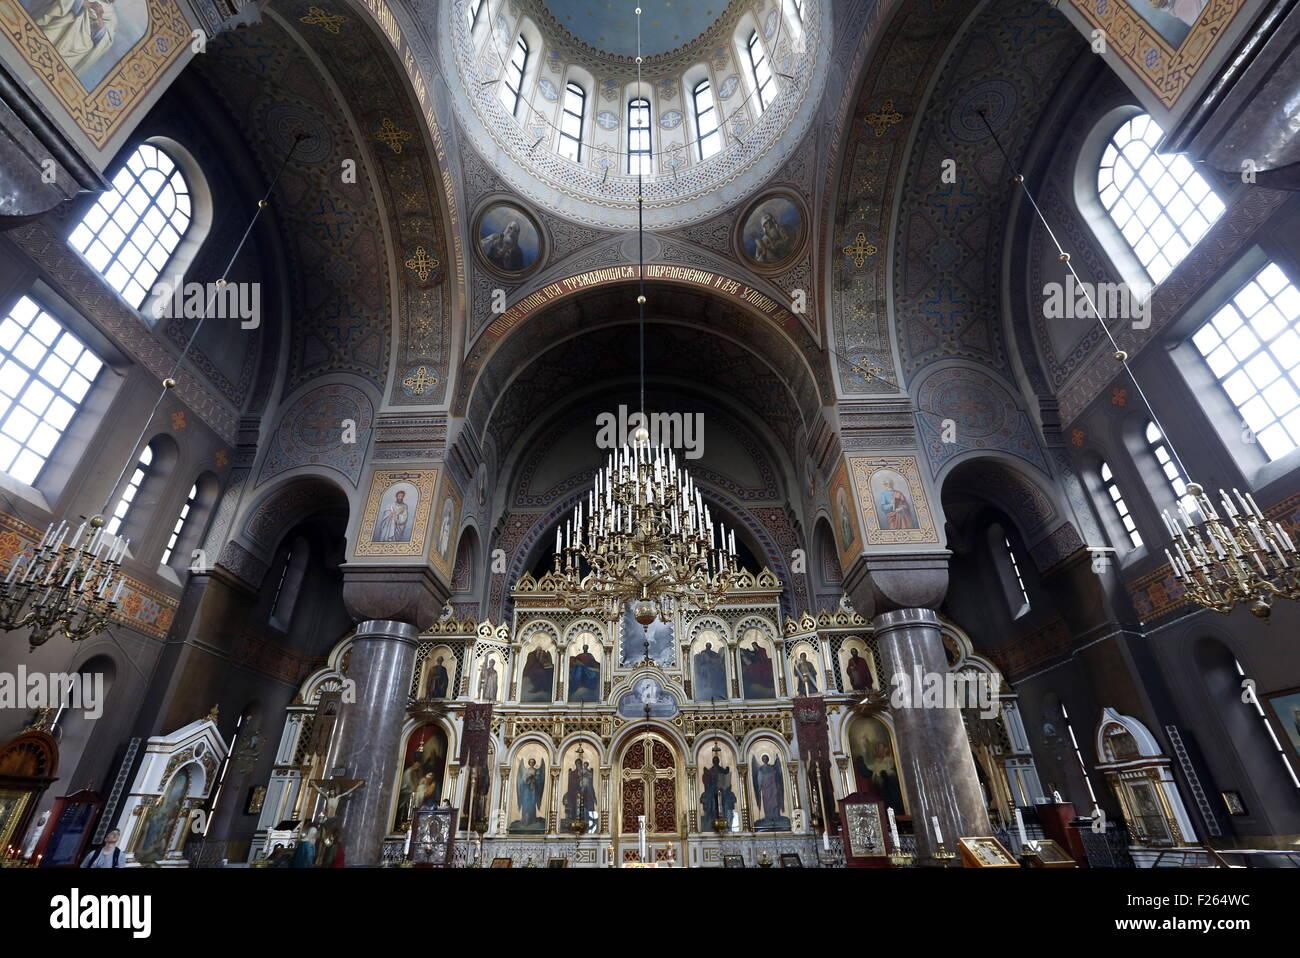 Helsinki, Finland. 1st Aug, 2015. Inside the Uspenski [Dormition] Cathedral. © Valery Matytsin/TASS/Alamy Live - Stock Image